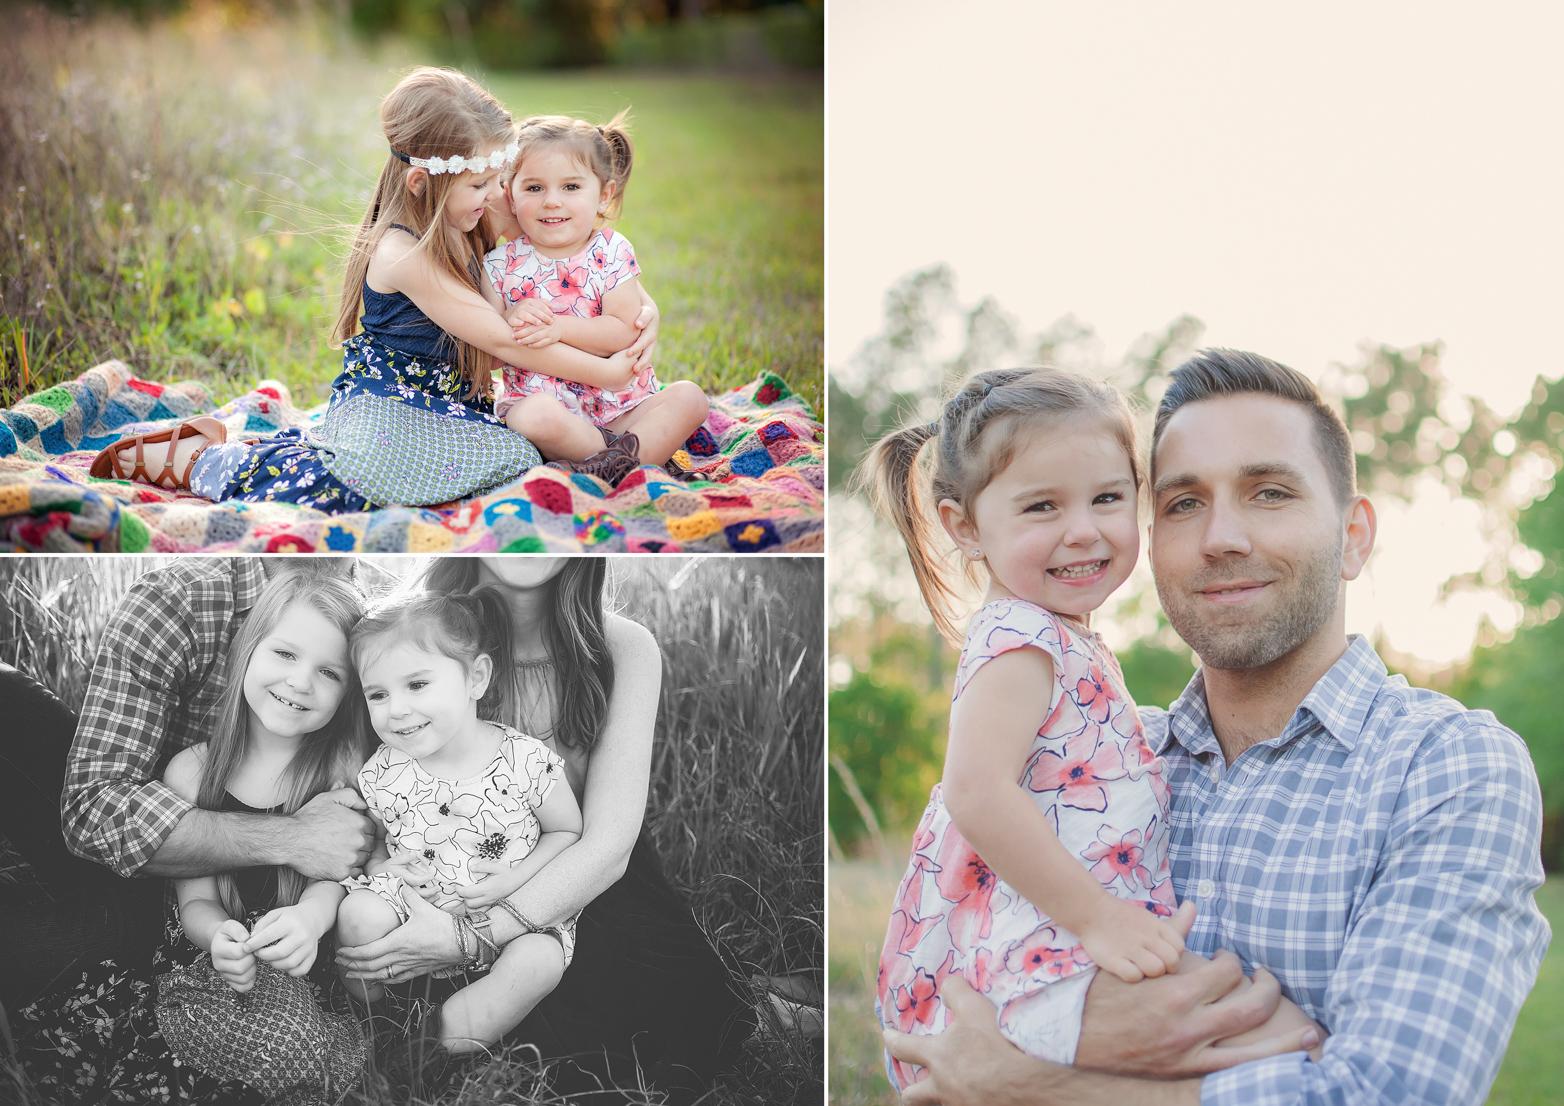 adam-szarmack-family-portraits-photography-love-7.jpg